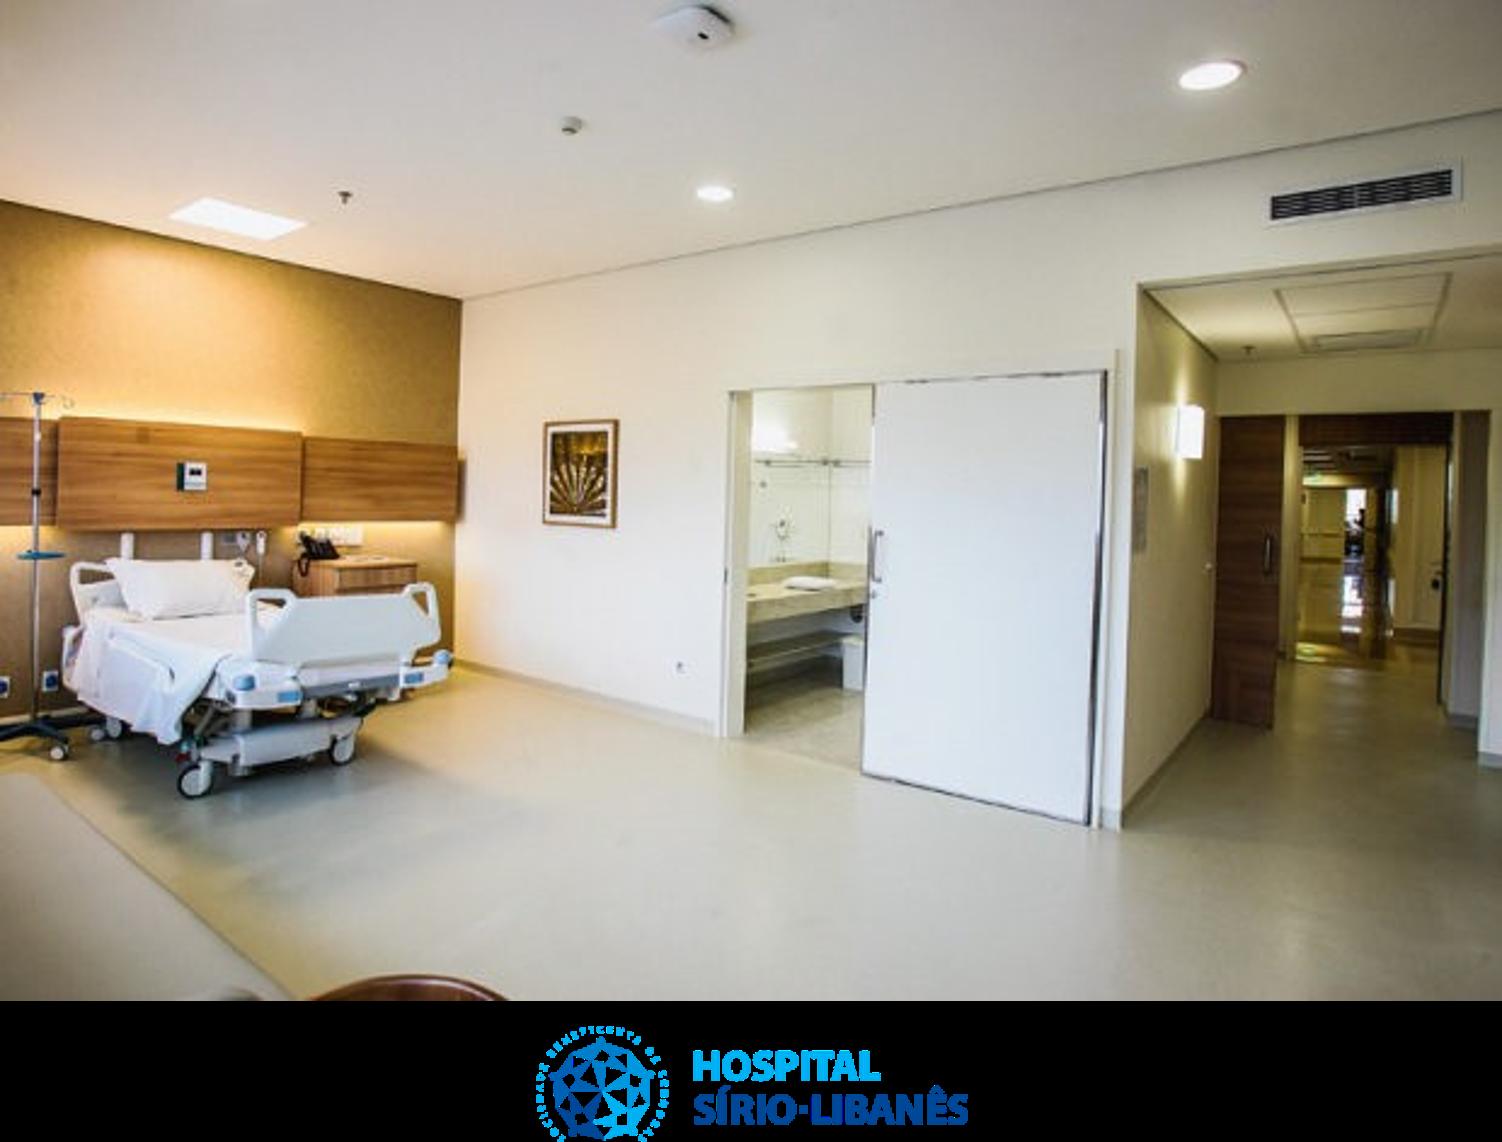 Cliente: Hospital Sírio Libanês